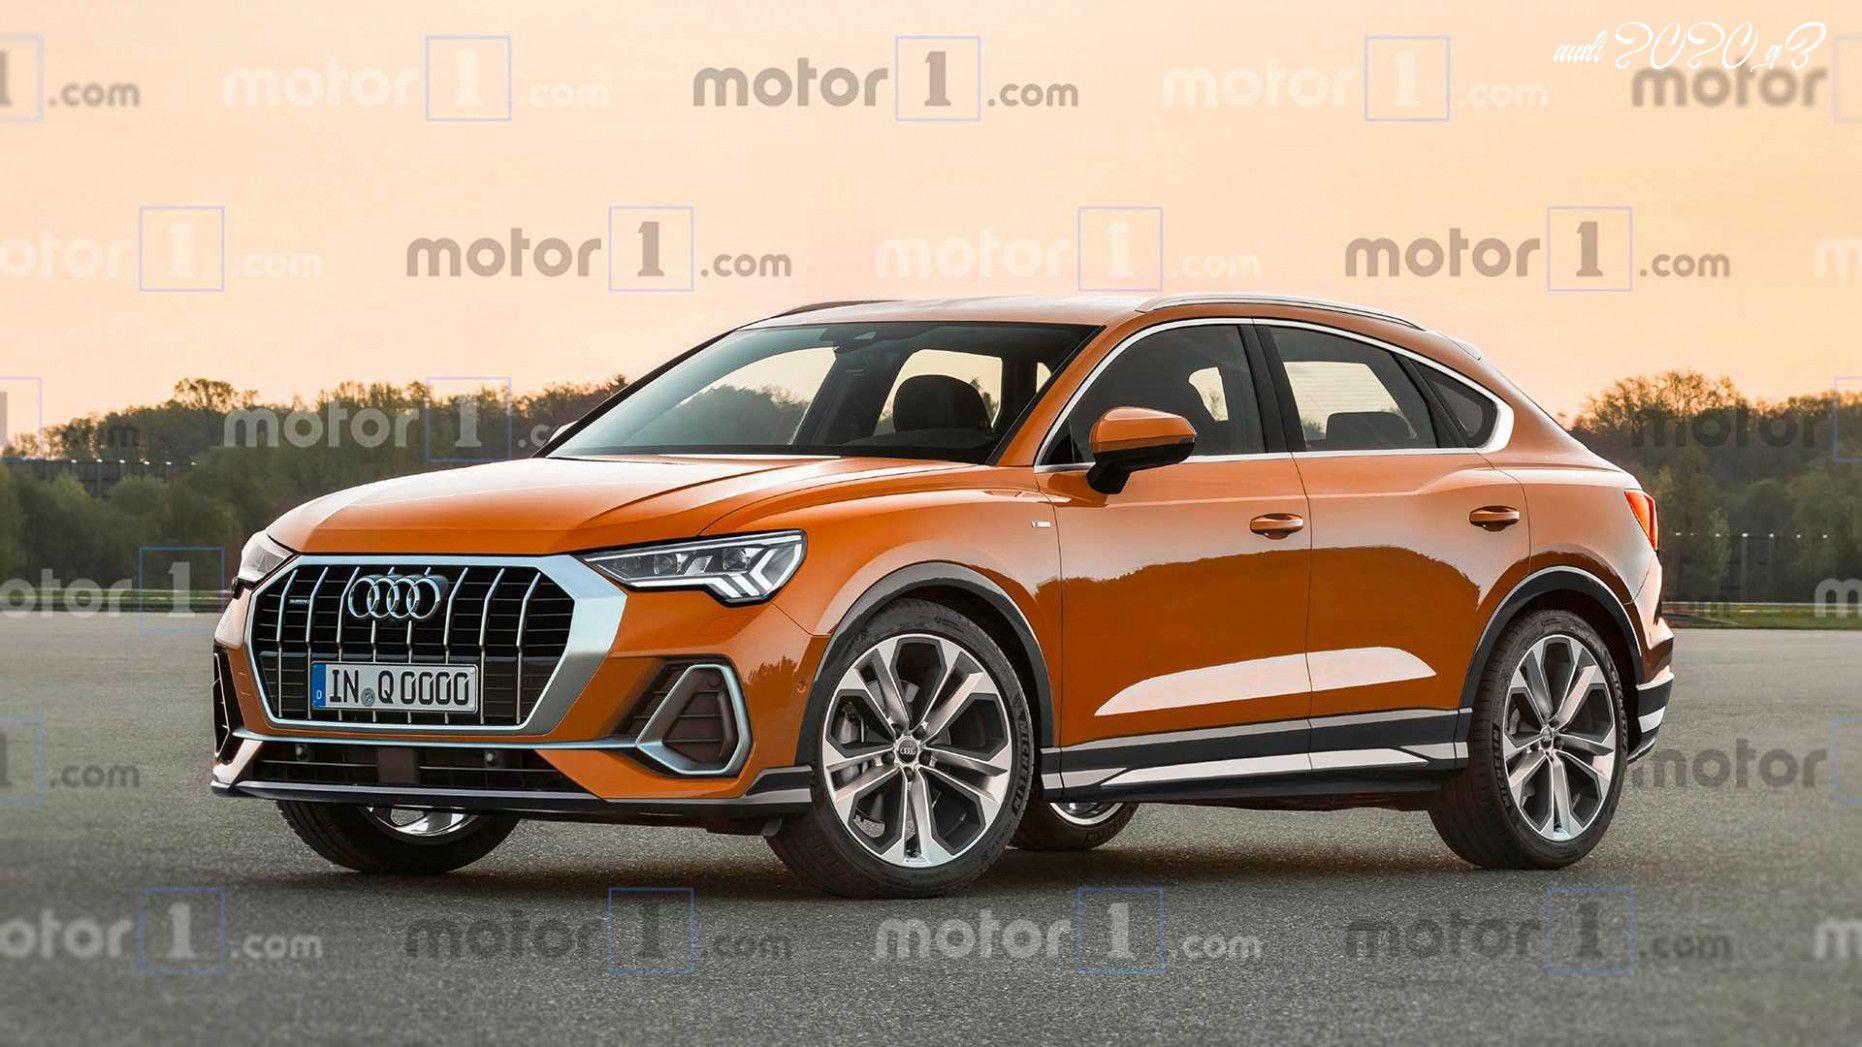 Audi 2020 Q3 Ratings In 2020 Audi Q3 Audi Audi Q4